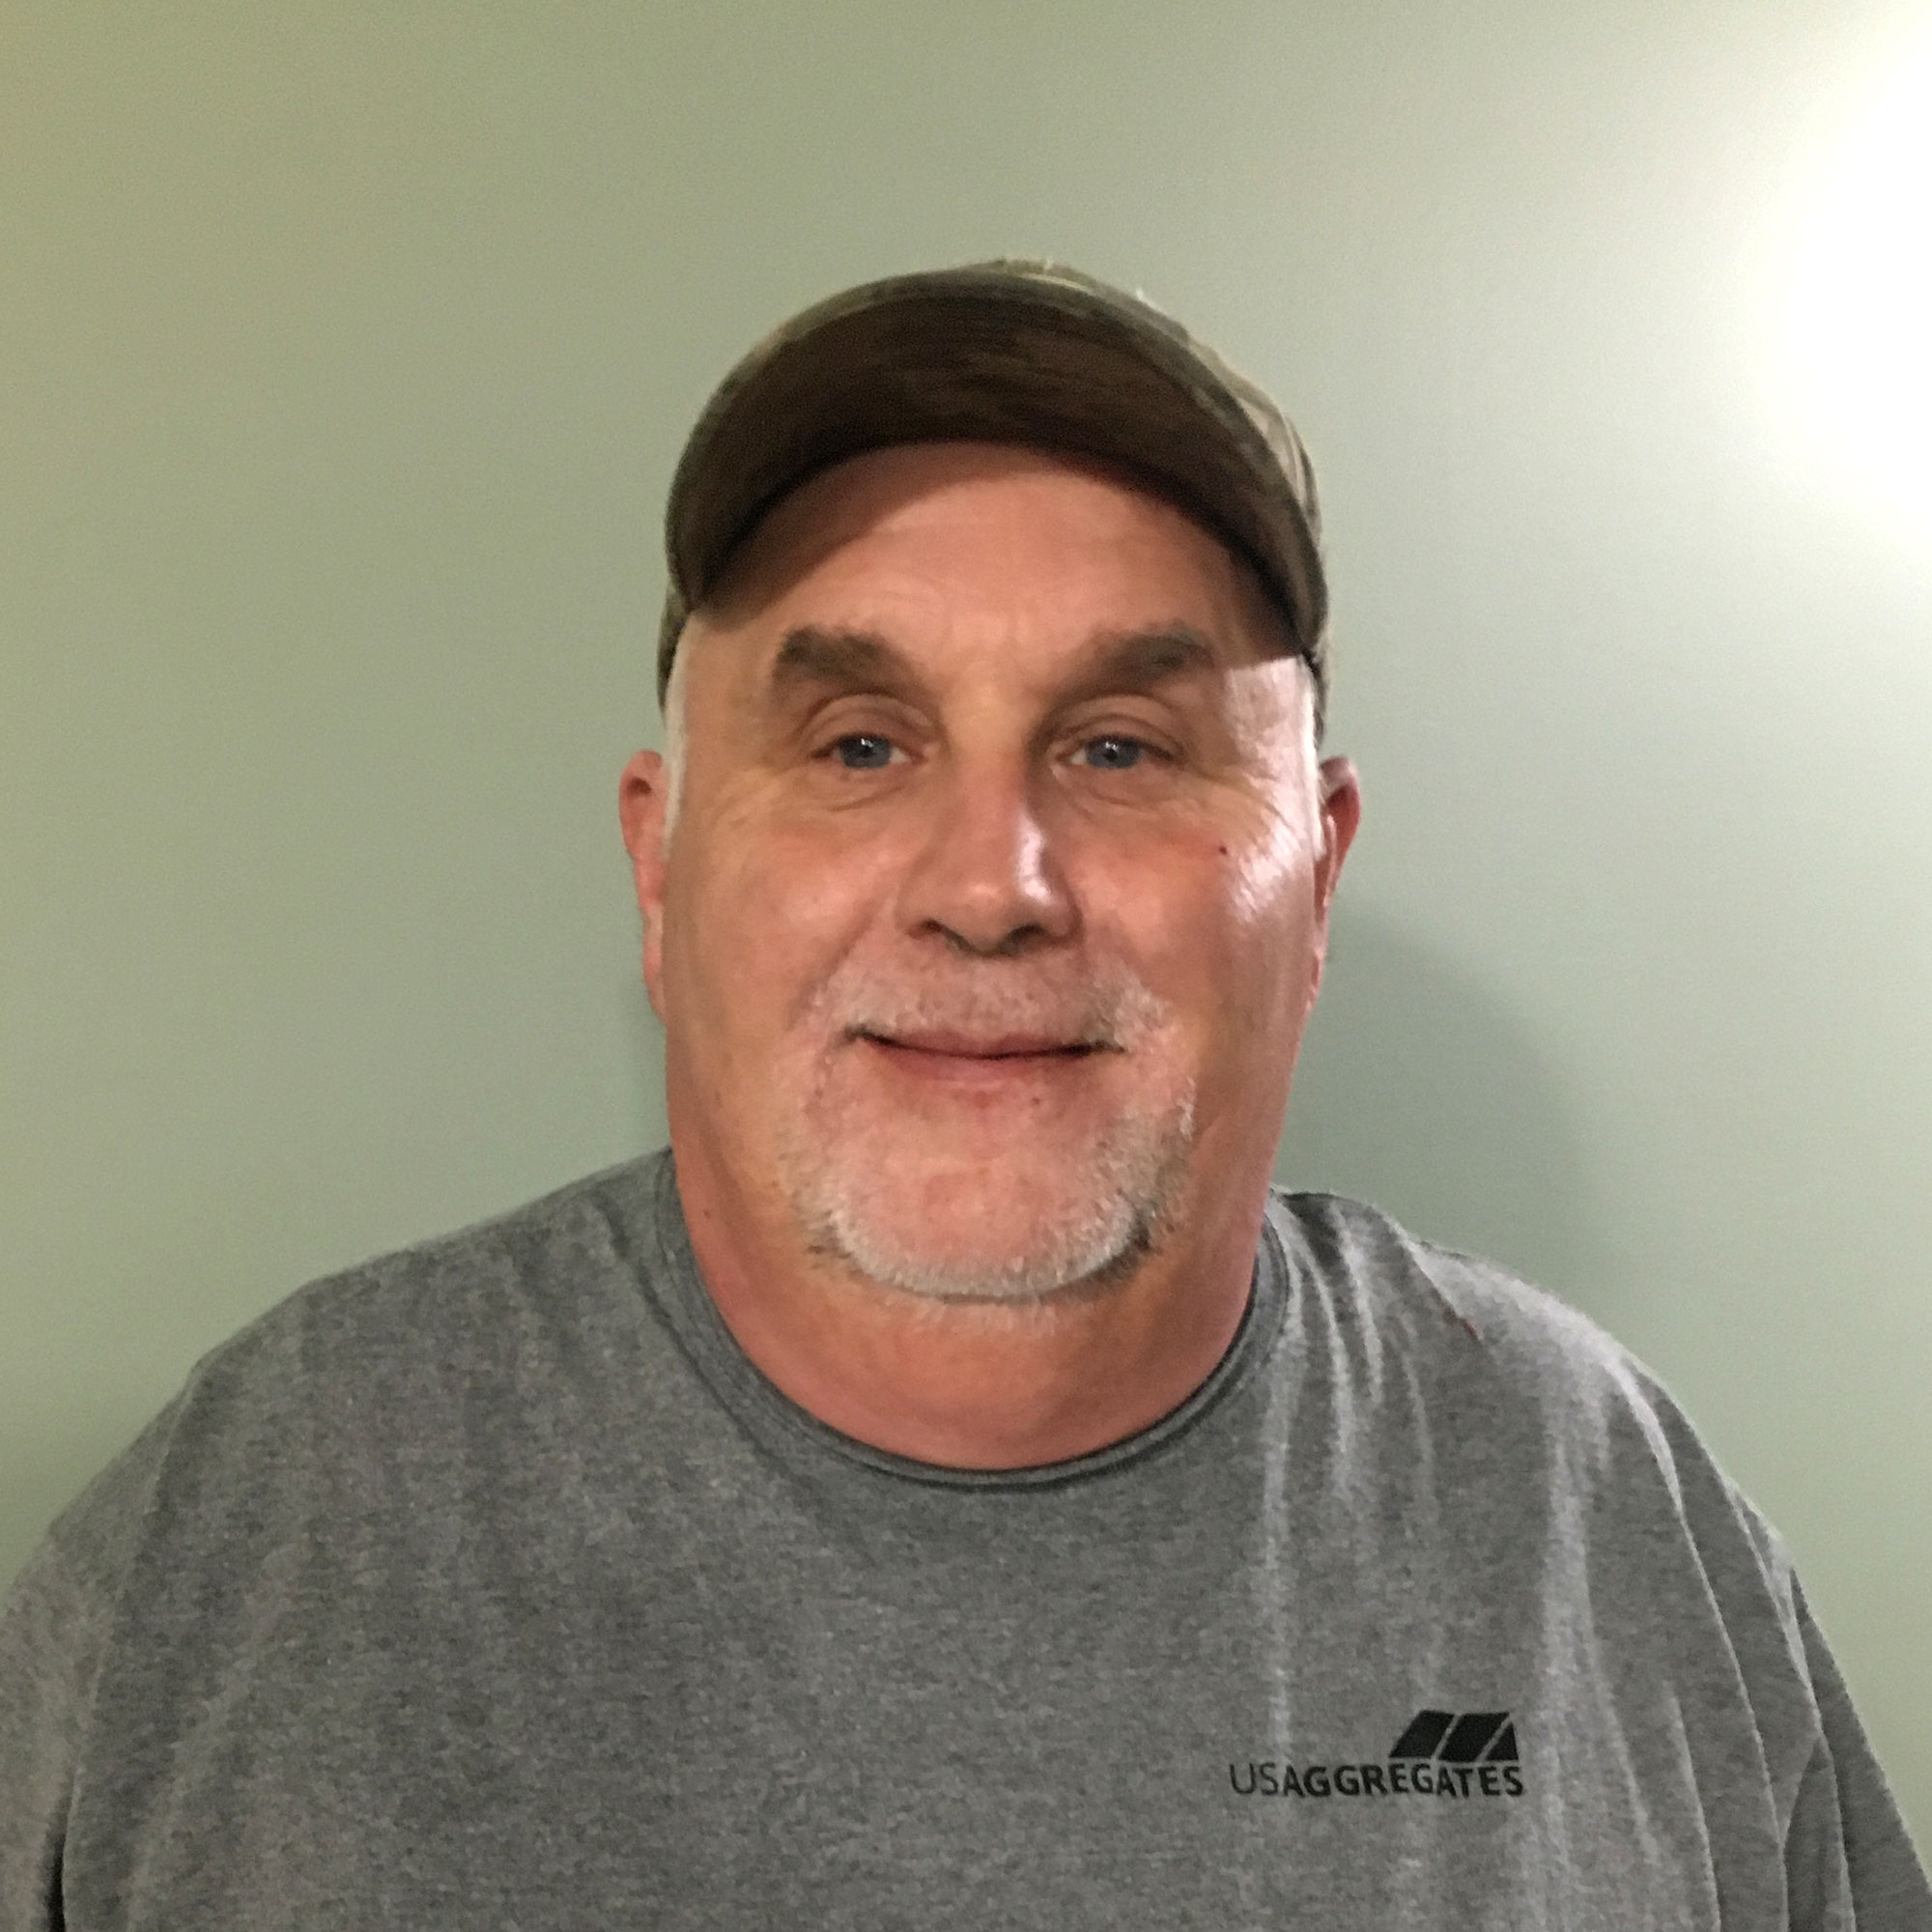 Photo of Randy Johnson the equipment operator